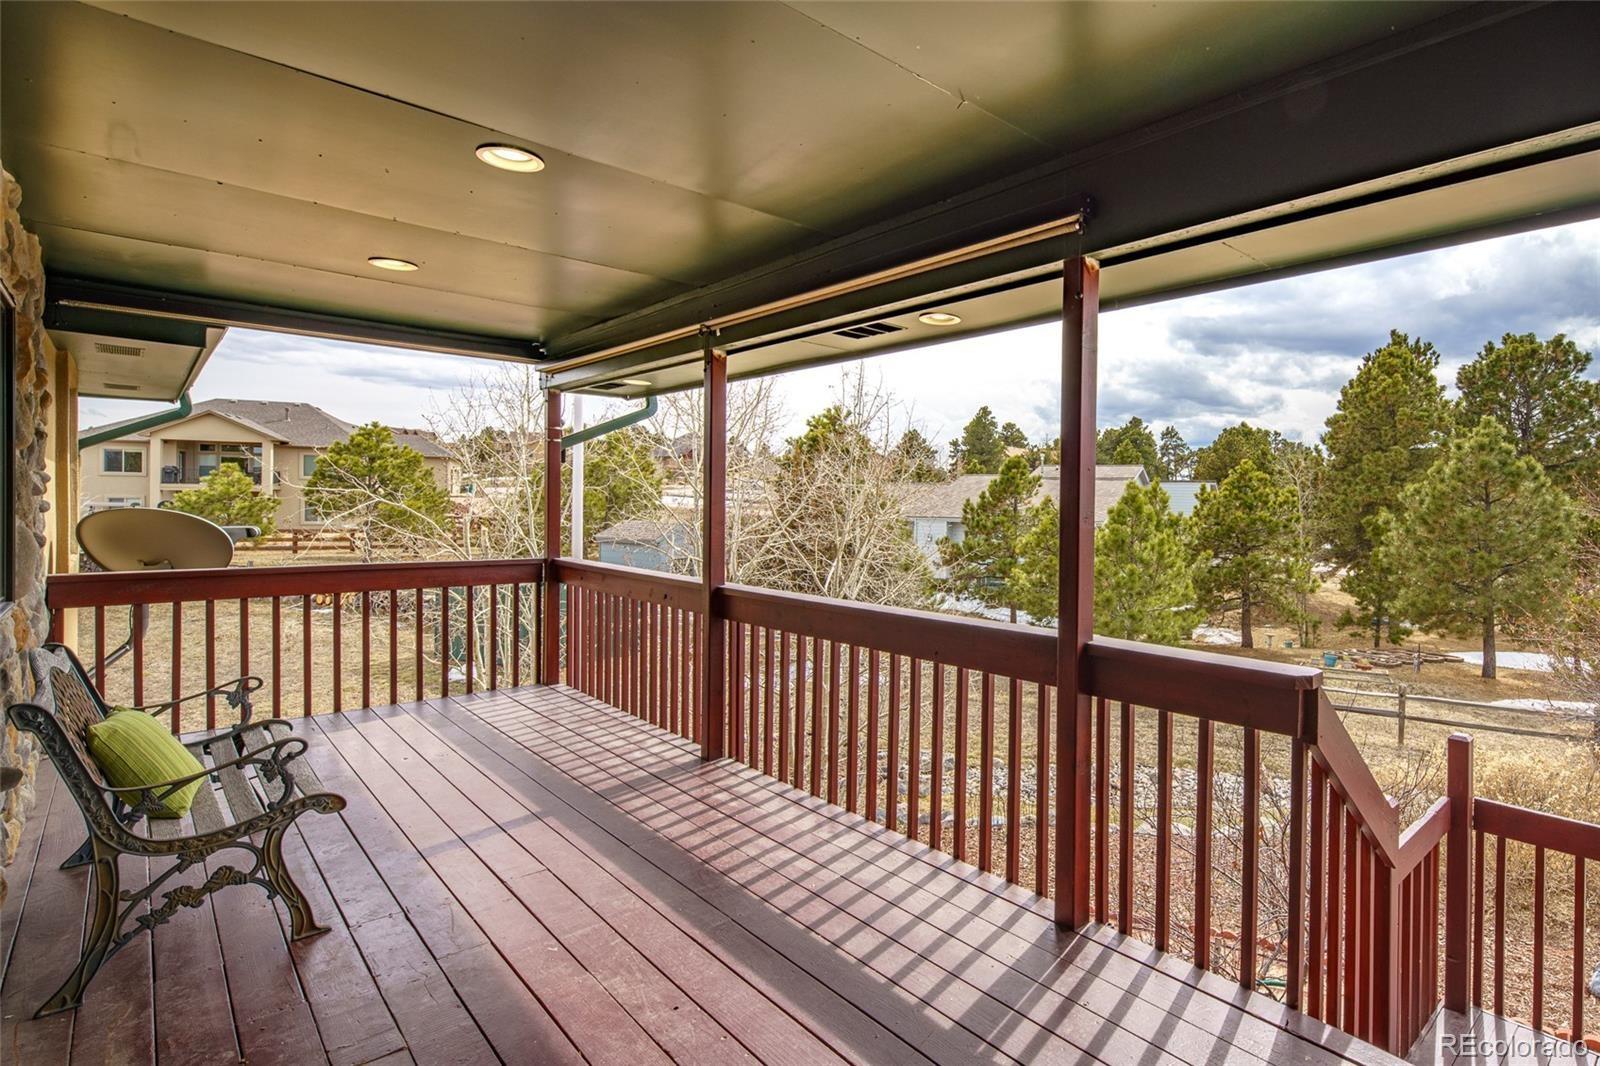 MLS# 9205685 - 7 - 17720 Pioneer Crossing, Colorado Springs, CO 80908